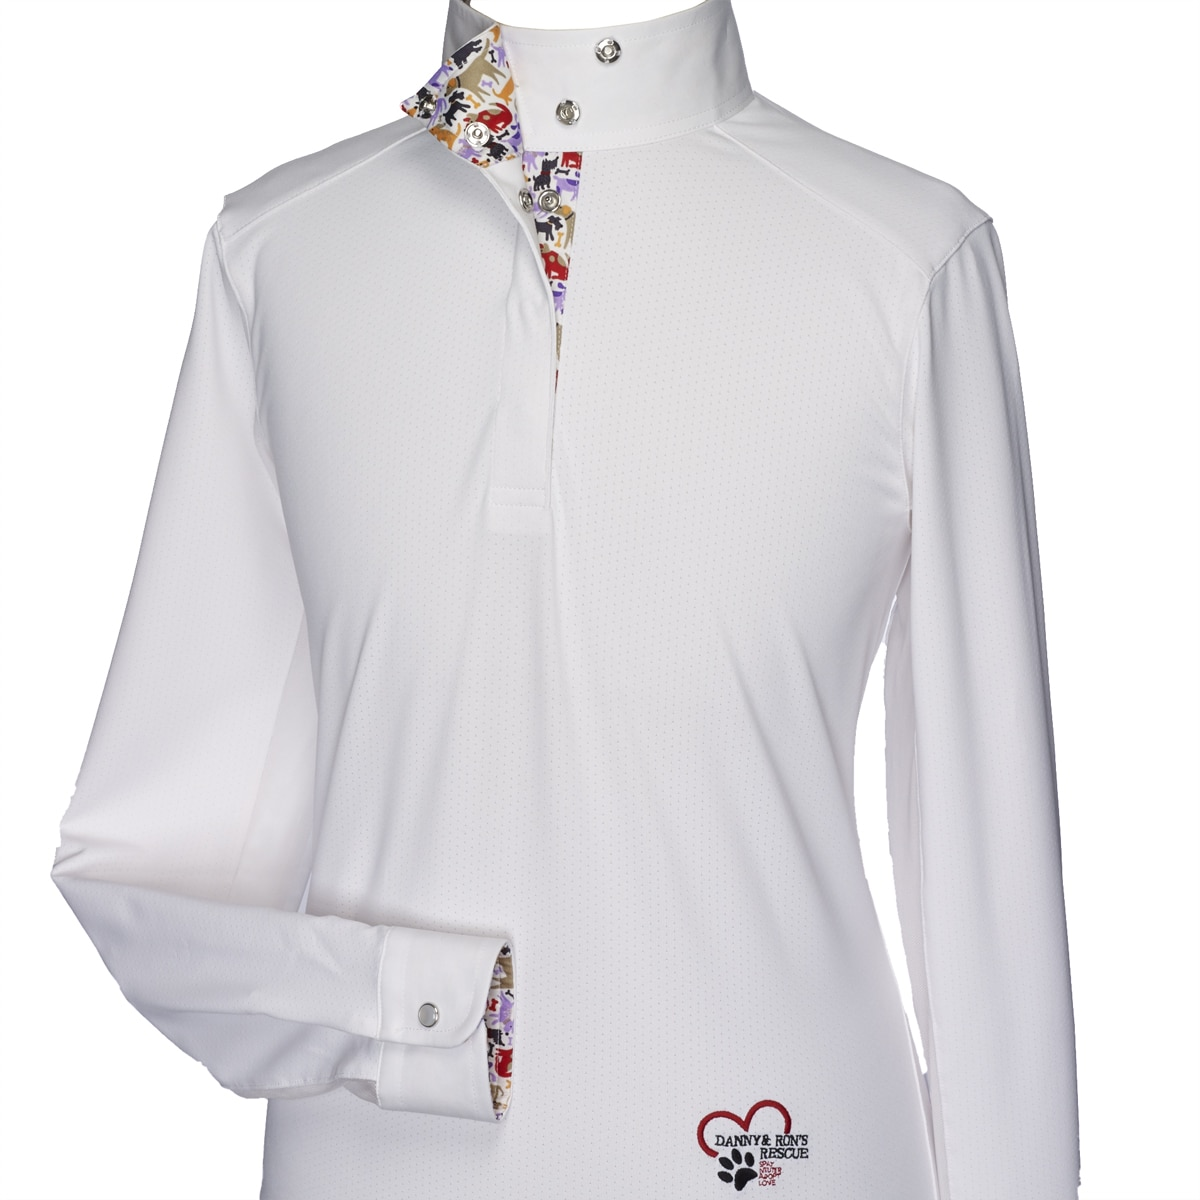 Essex Talent Yarn White Show Shirts